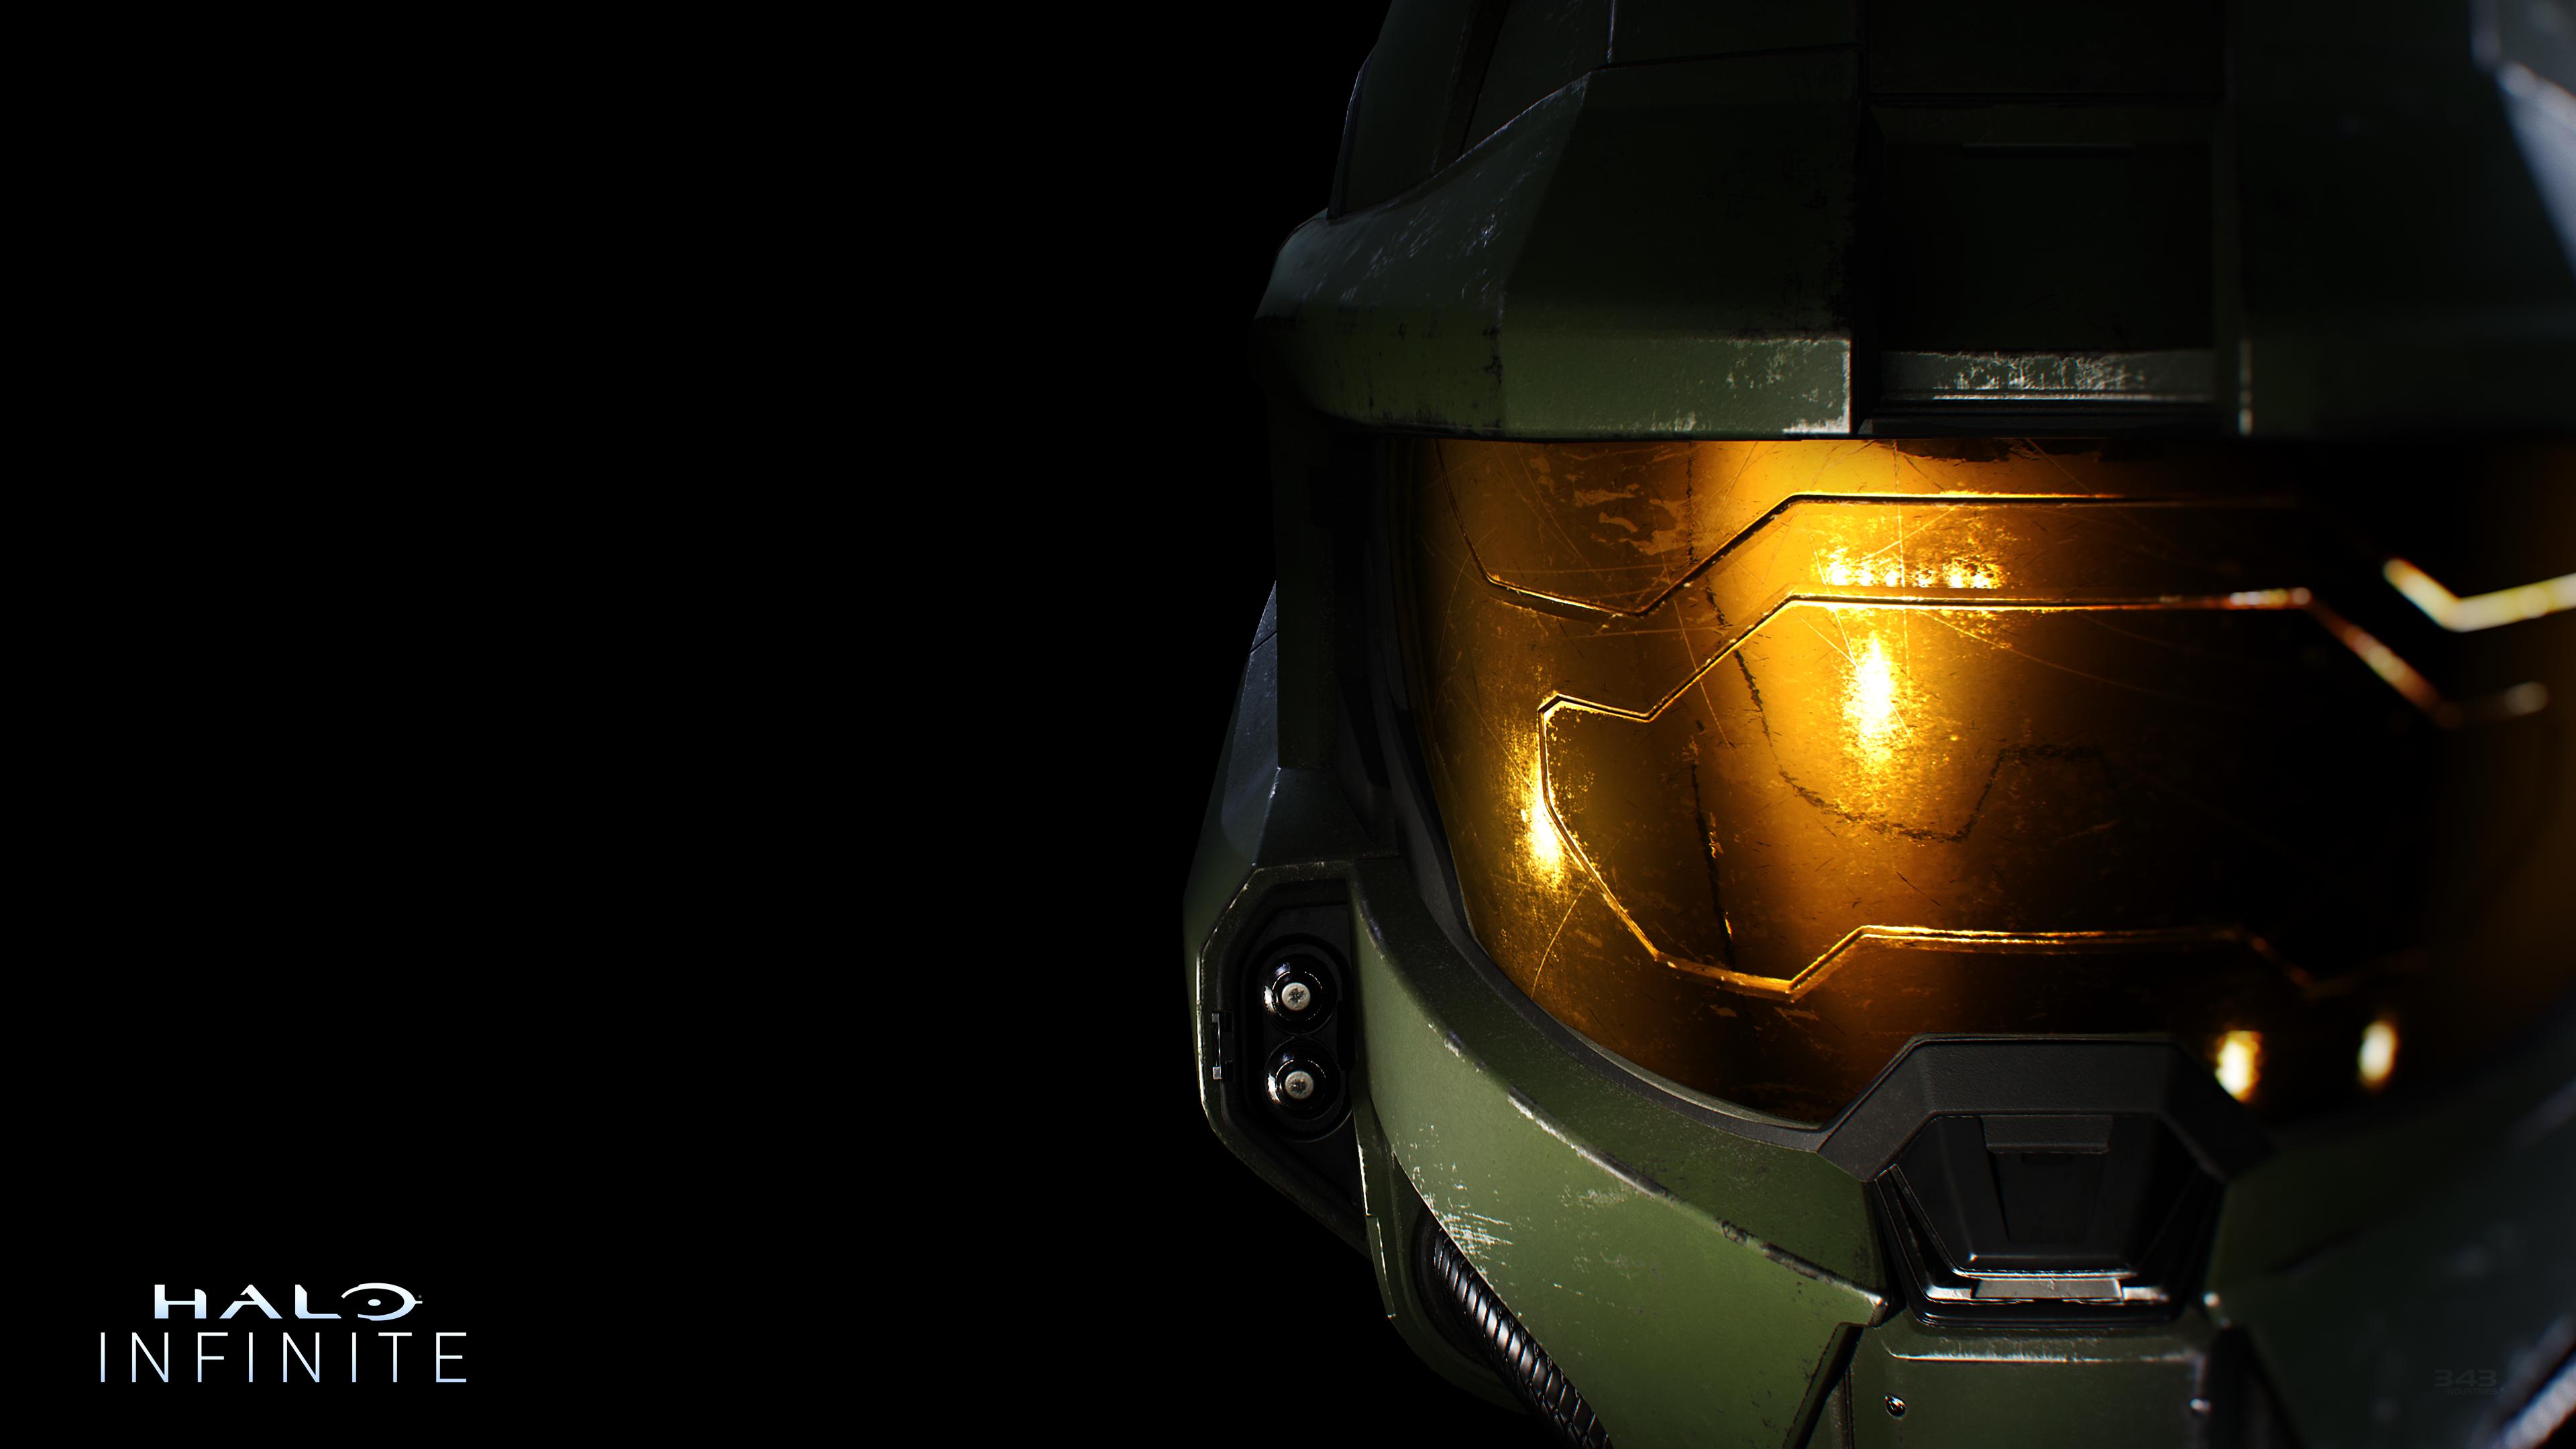 Halo Infinite Video game